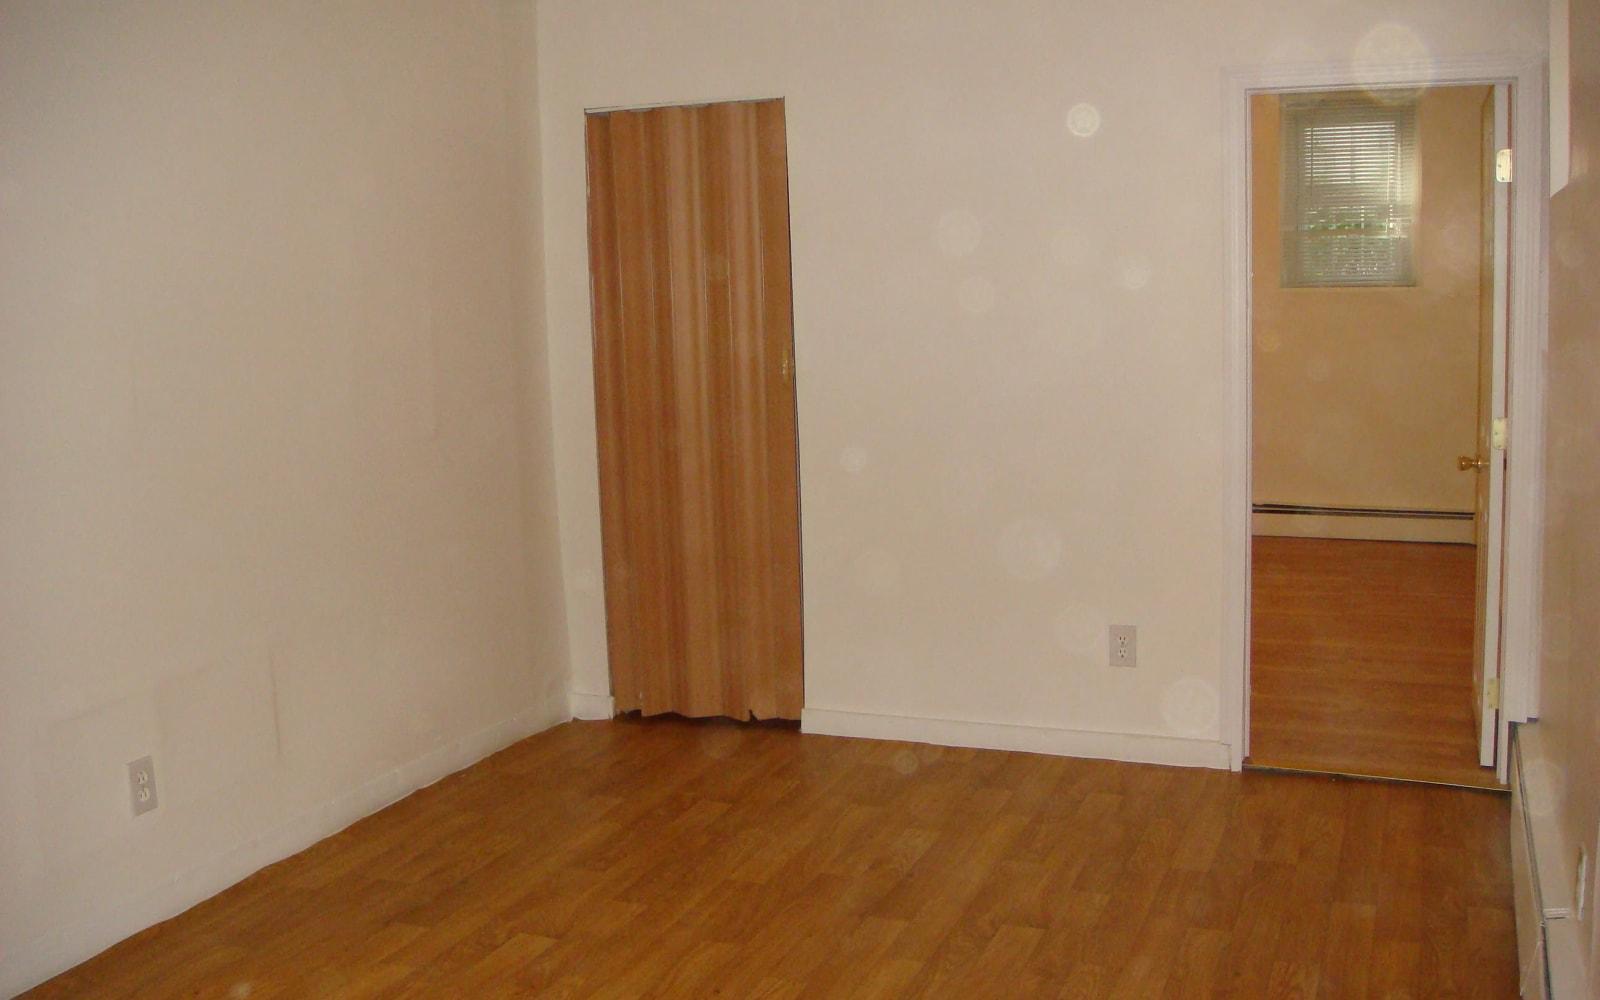 Closet in the bedroom at 400 Atlantic in Bridgeport, Connecticut